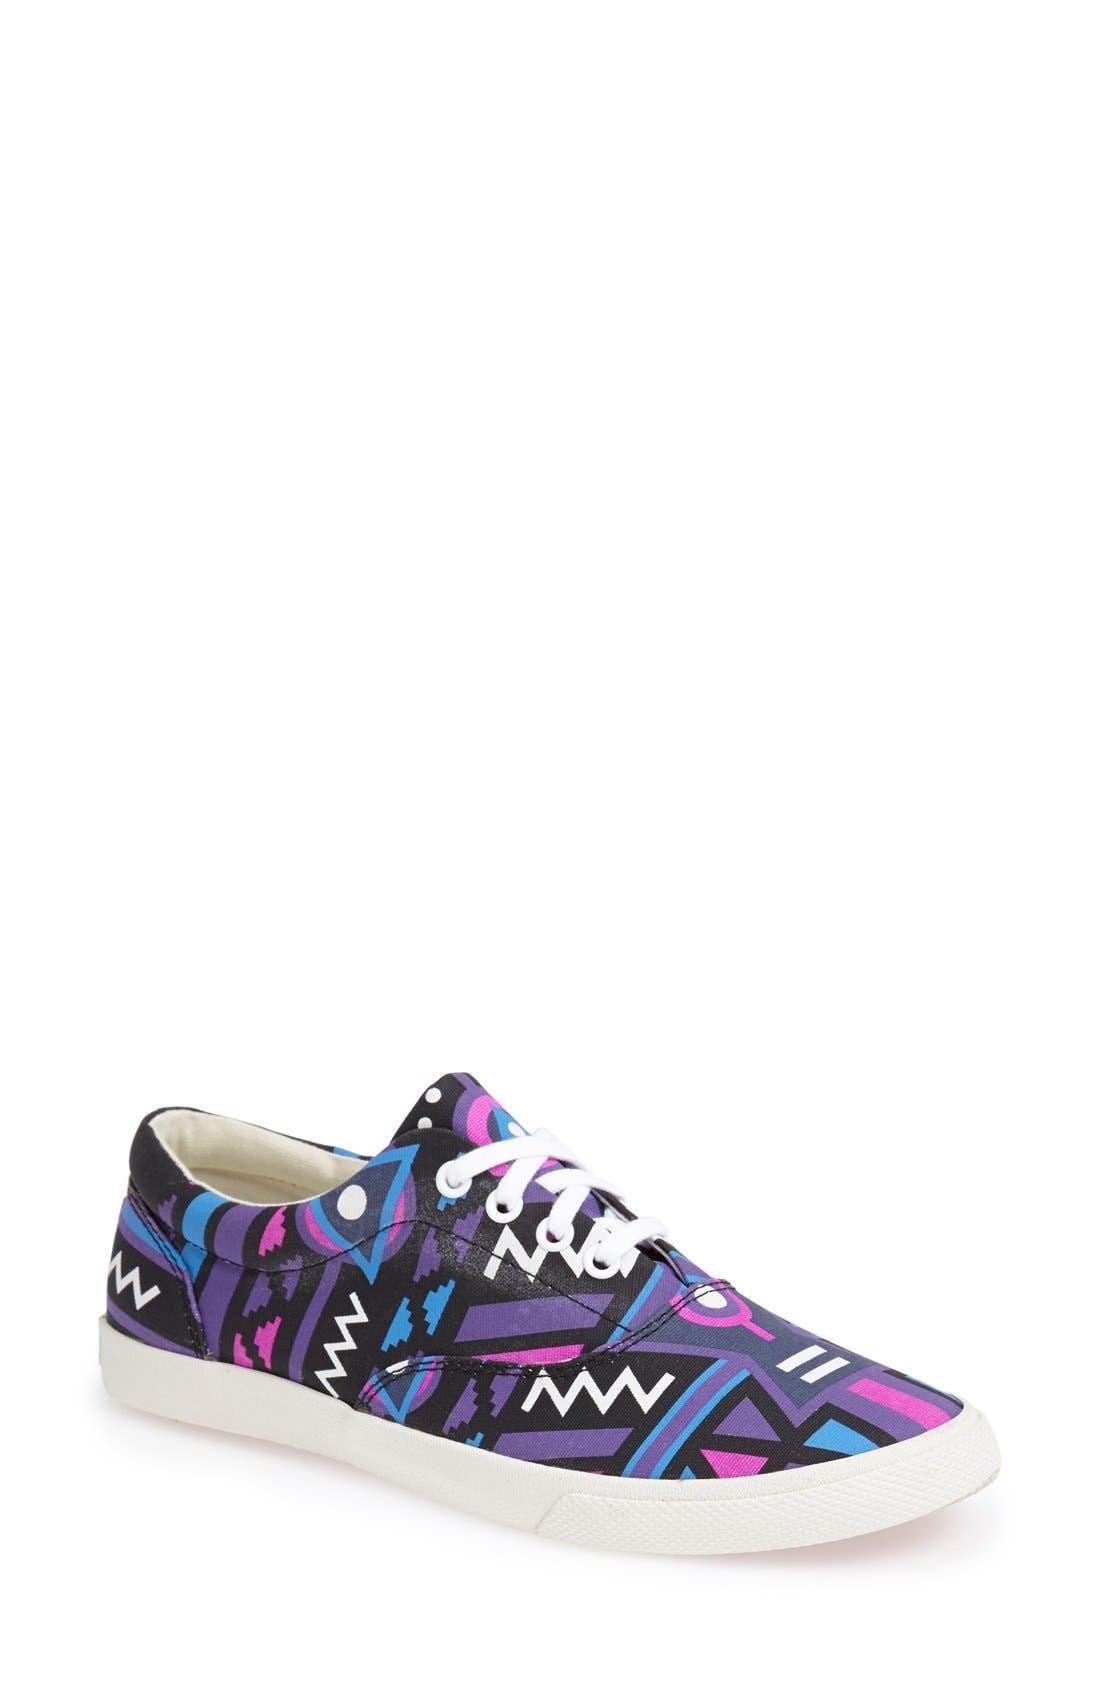 Alternate Image 1 Selected - BucketFeet 'Cosmos 2' Sneaker (Women)